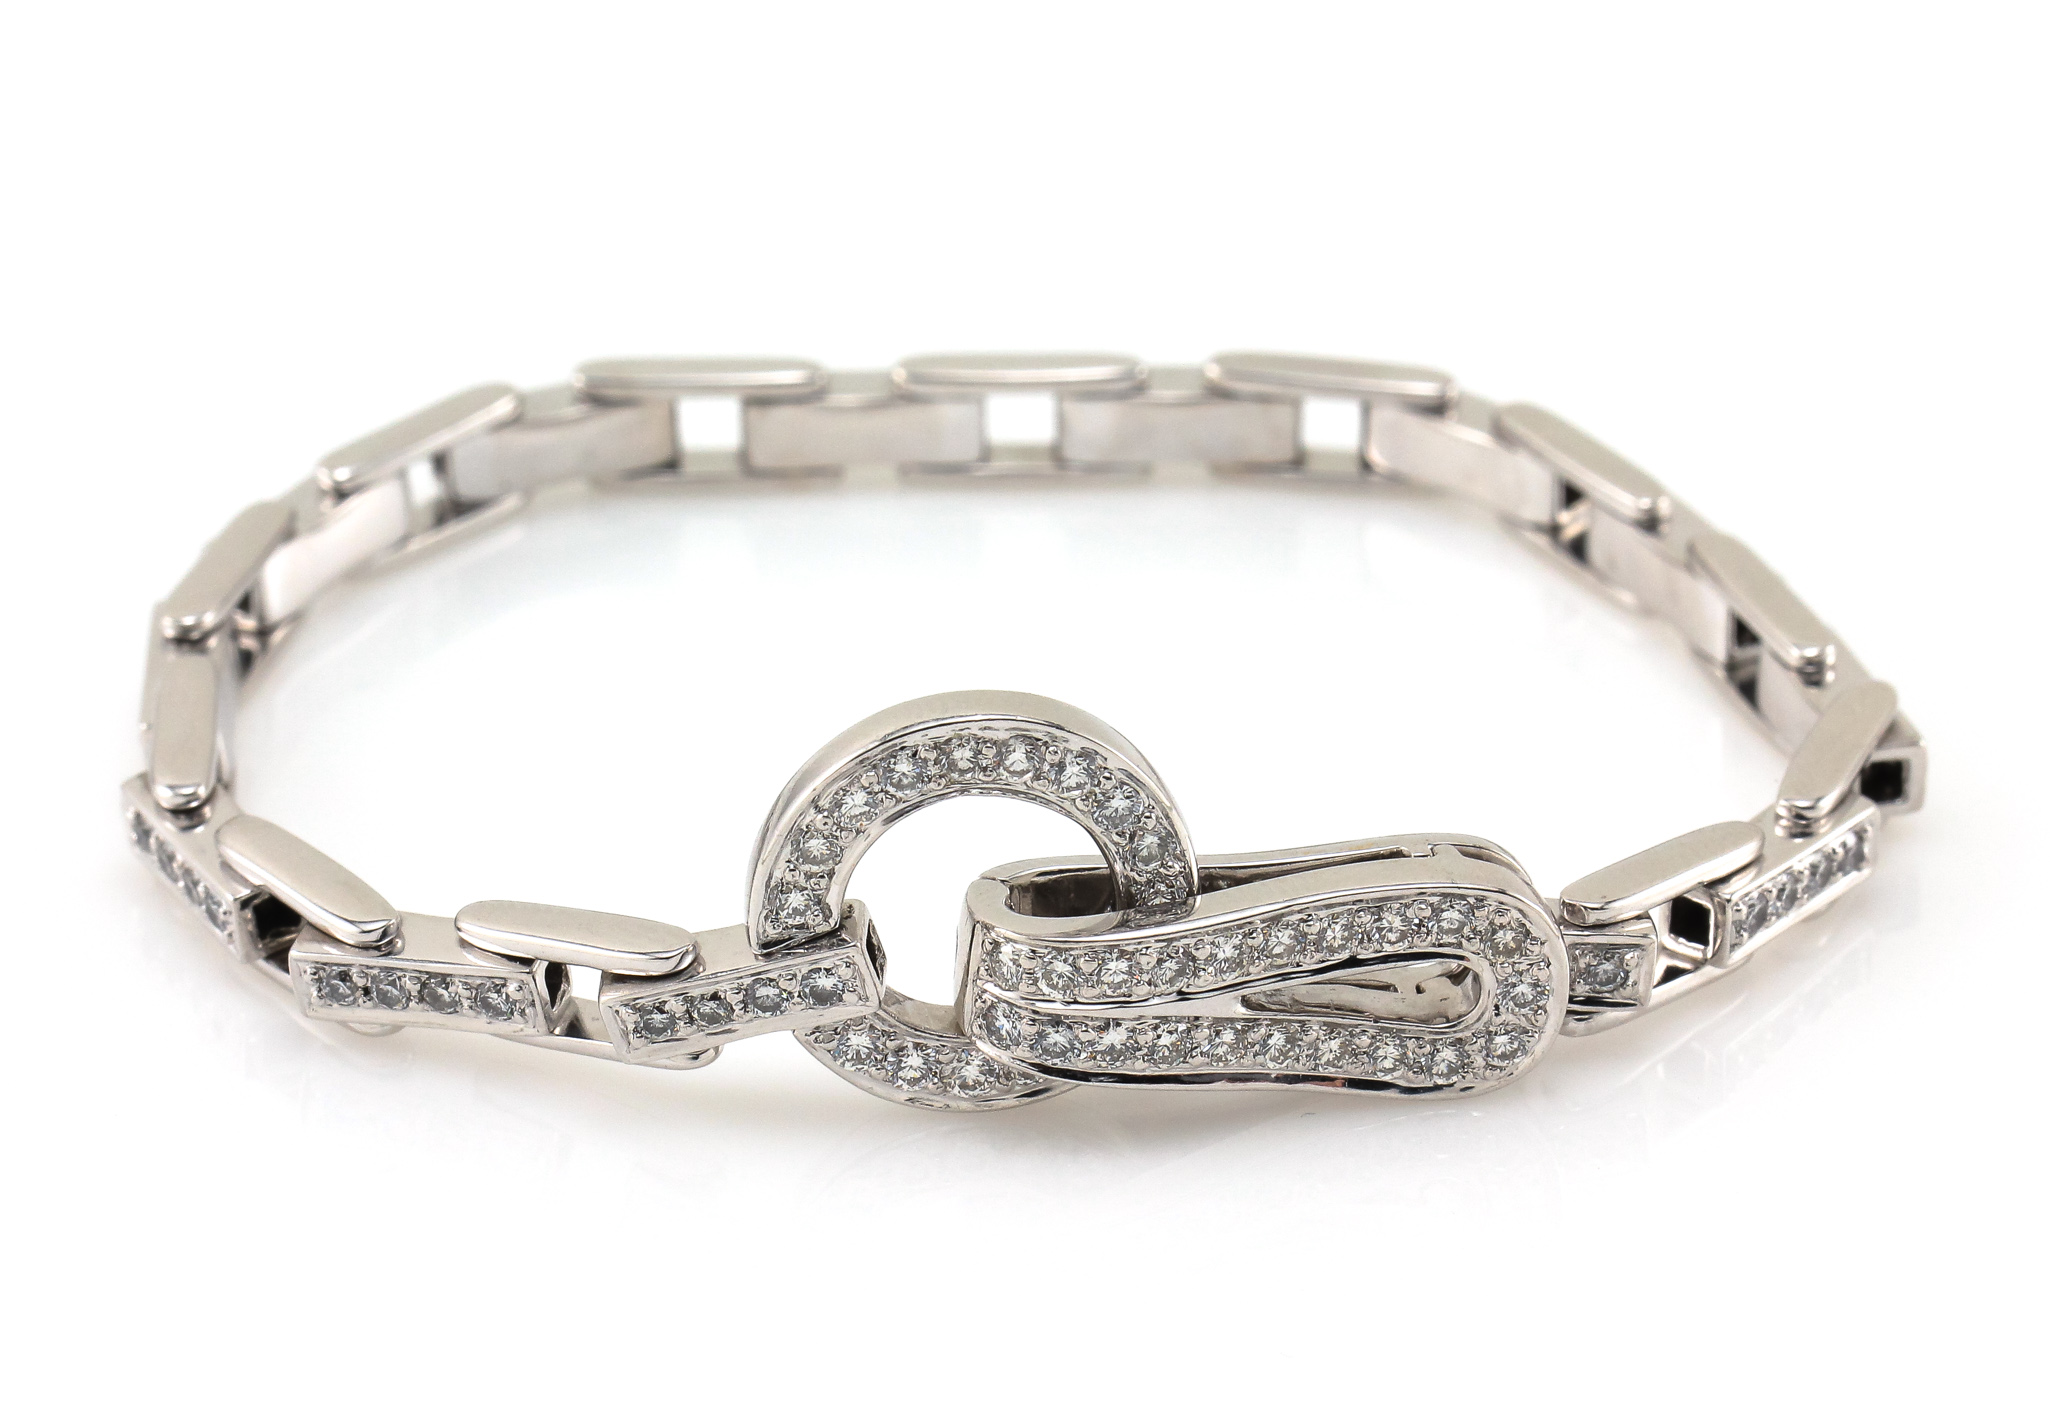 09c847291bc 18K Diamond Link Bracelet White Gold Fold Over Clasp